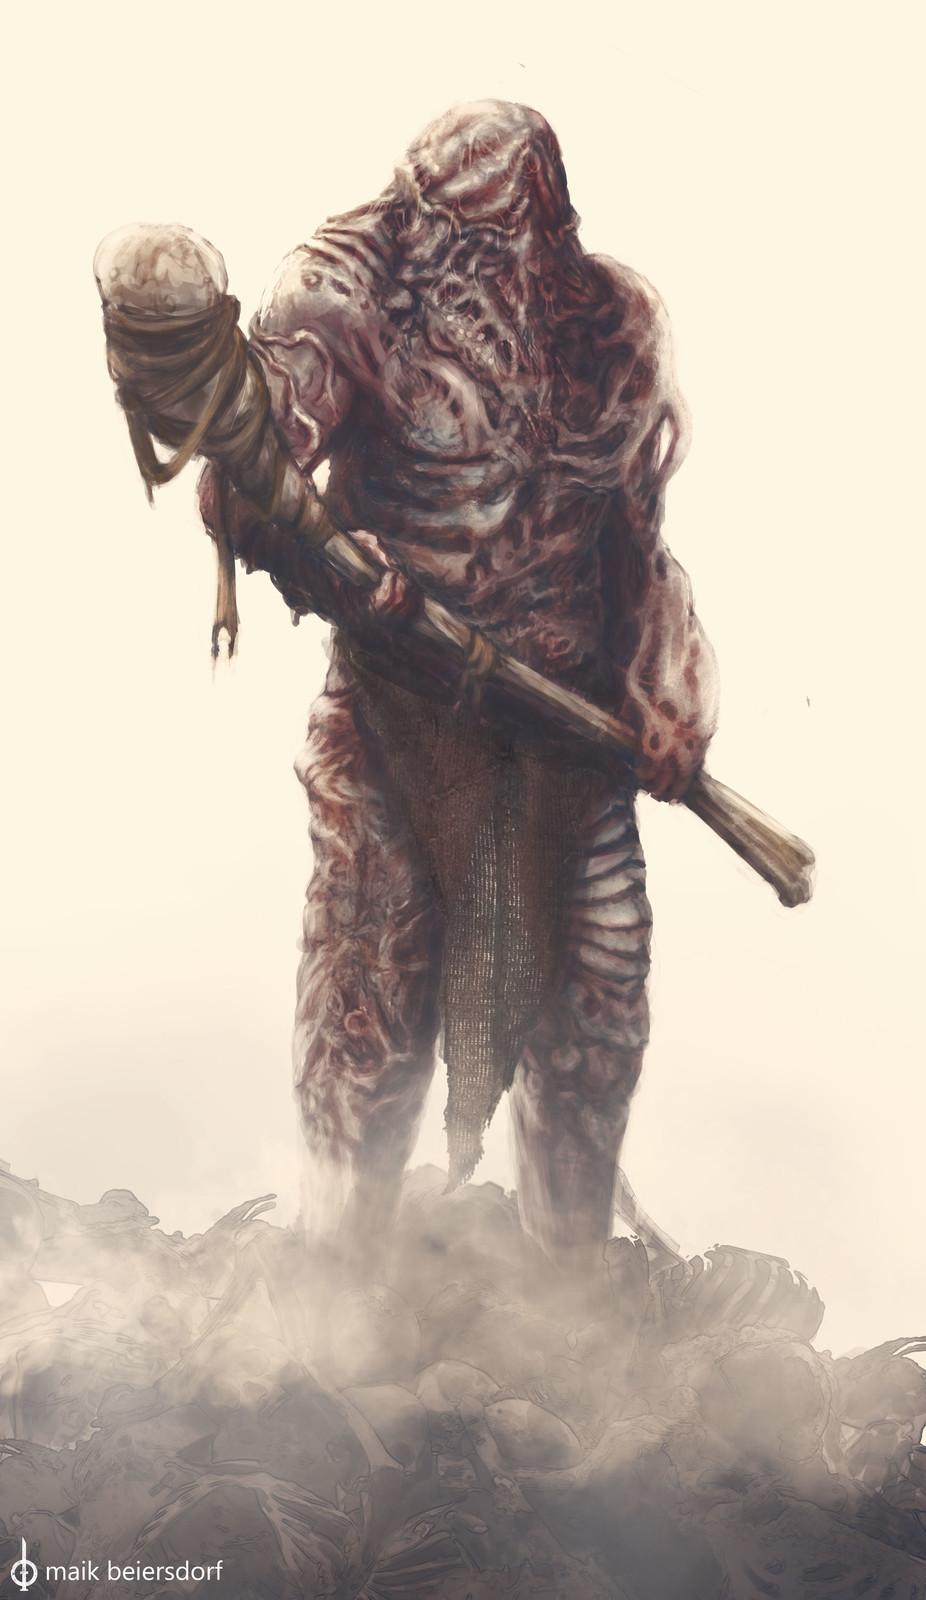 Ospel's Creature